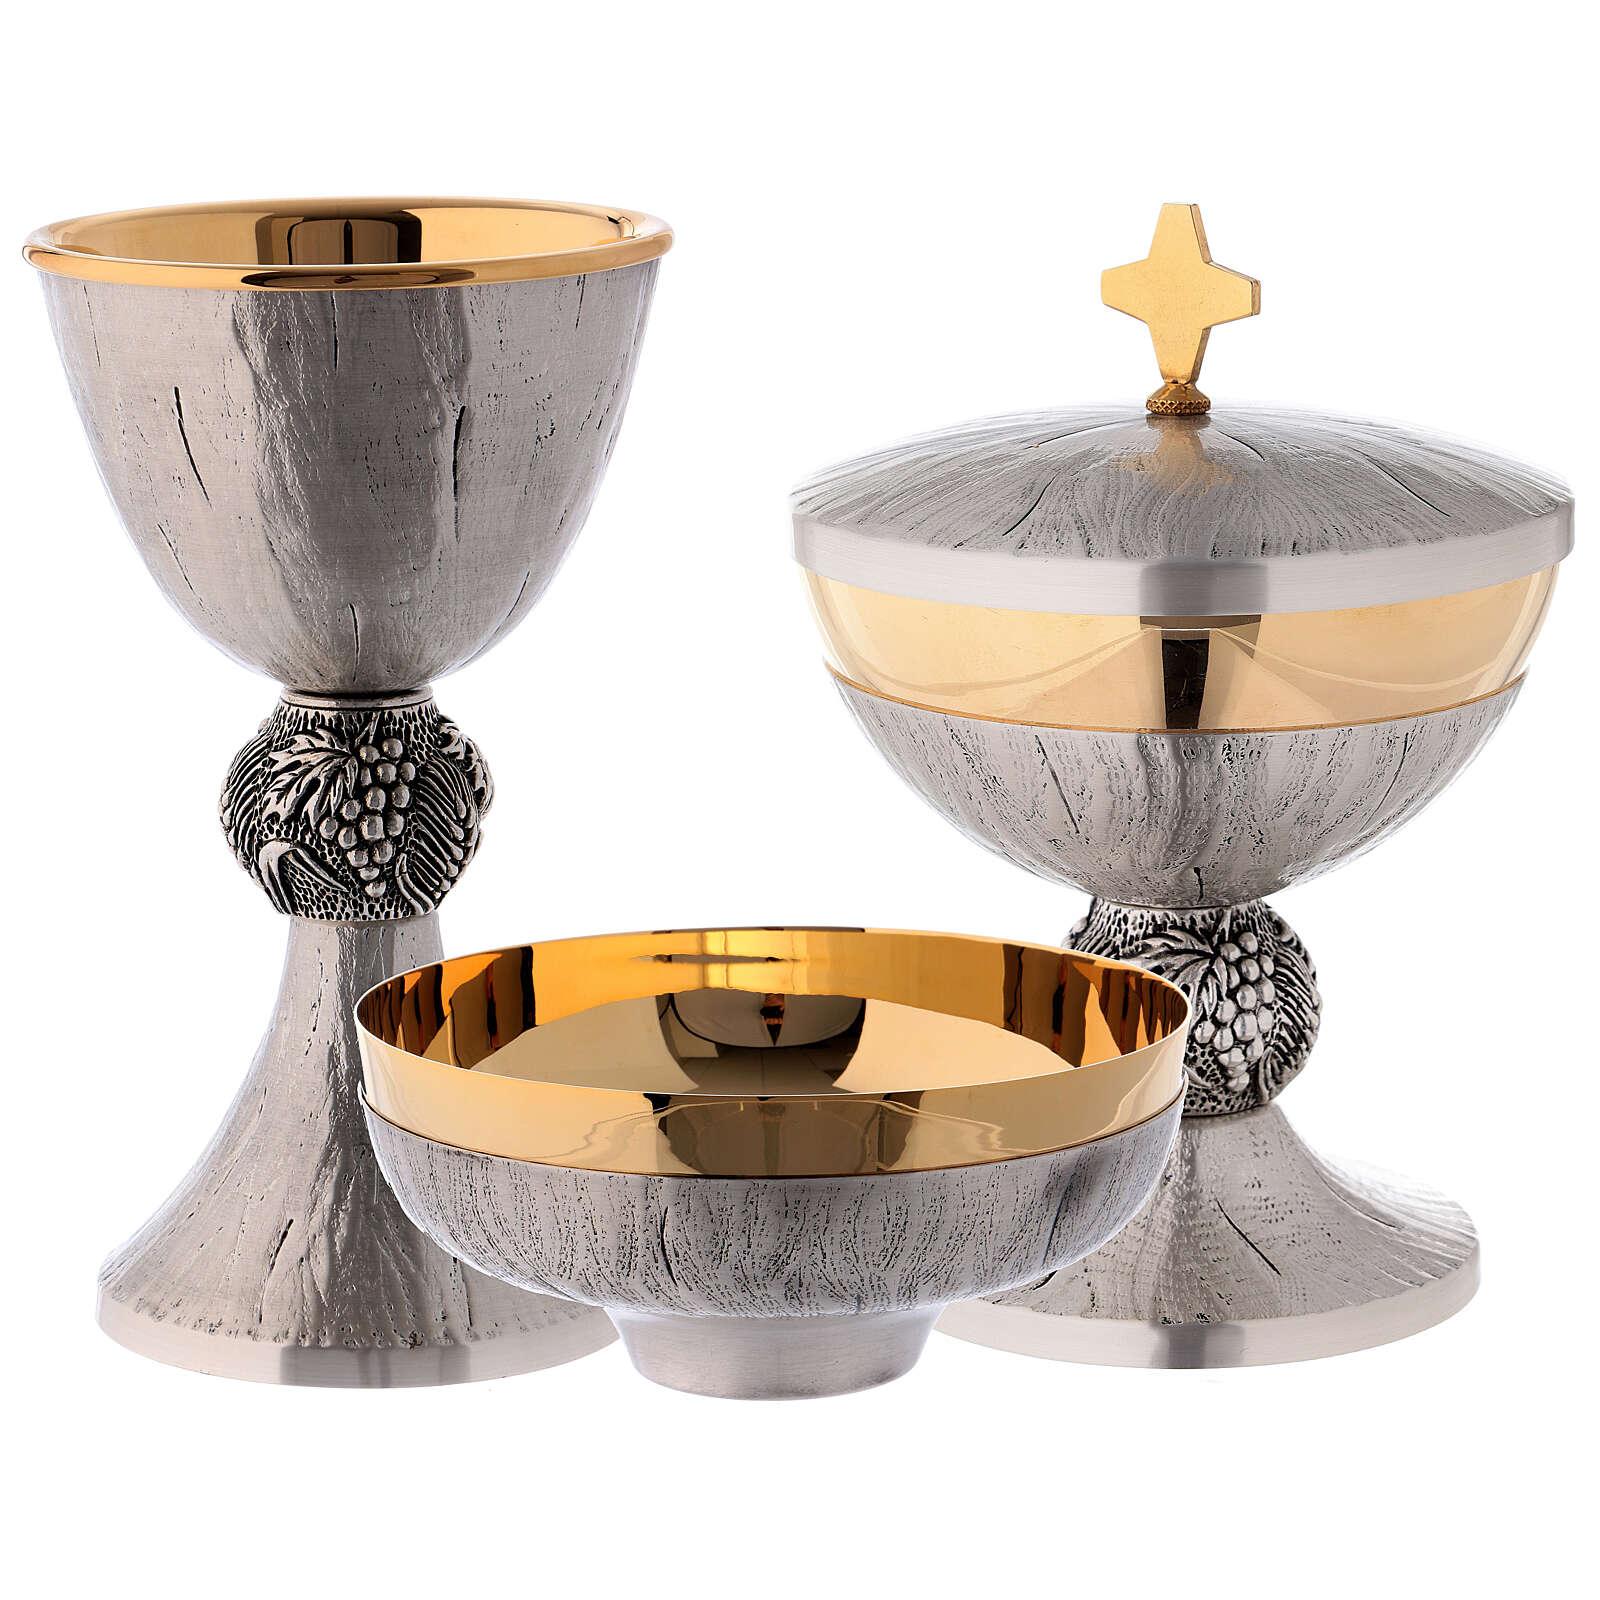 Calice pisside patena ottone argento uva spighe 4